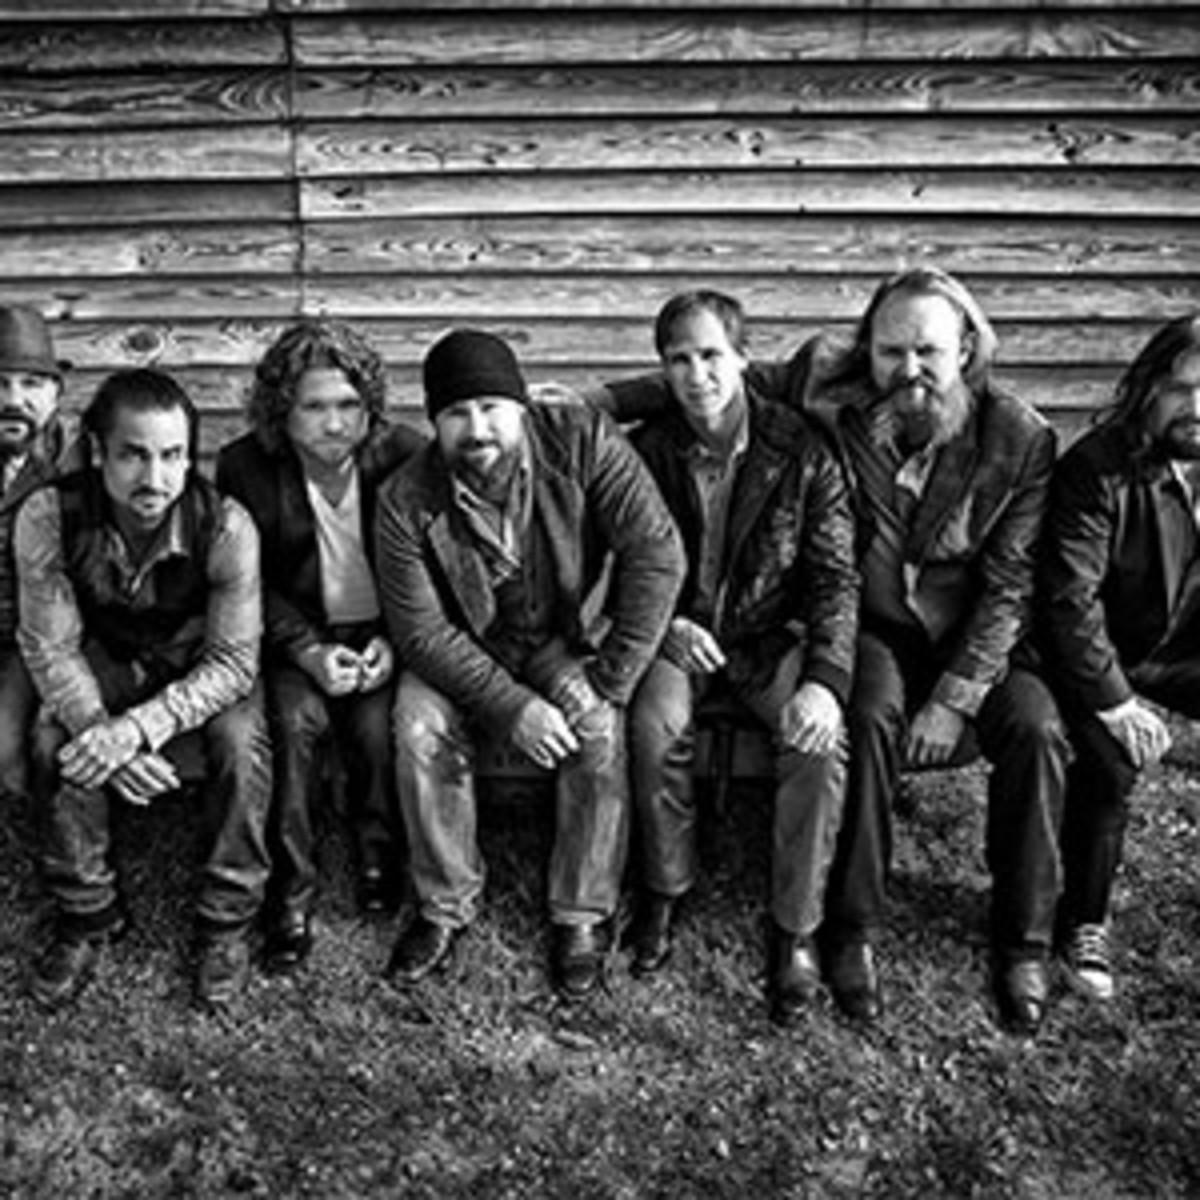 RodeoHouston 2014 concert: Zac Brown Band